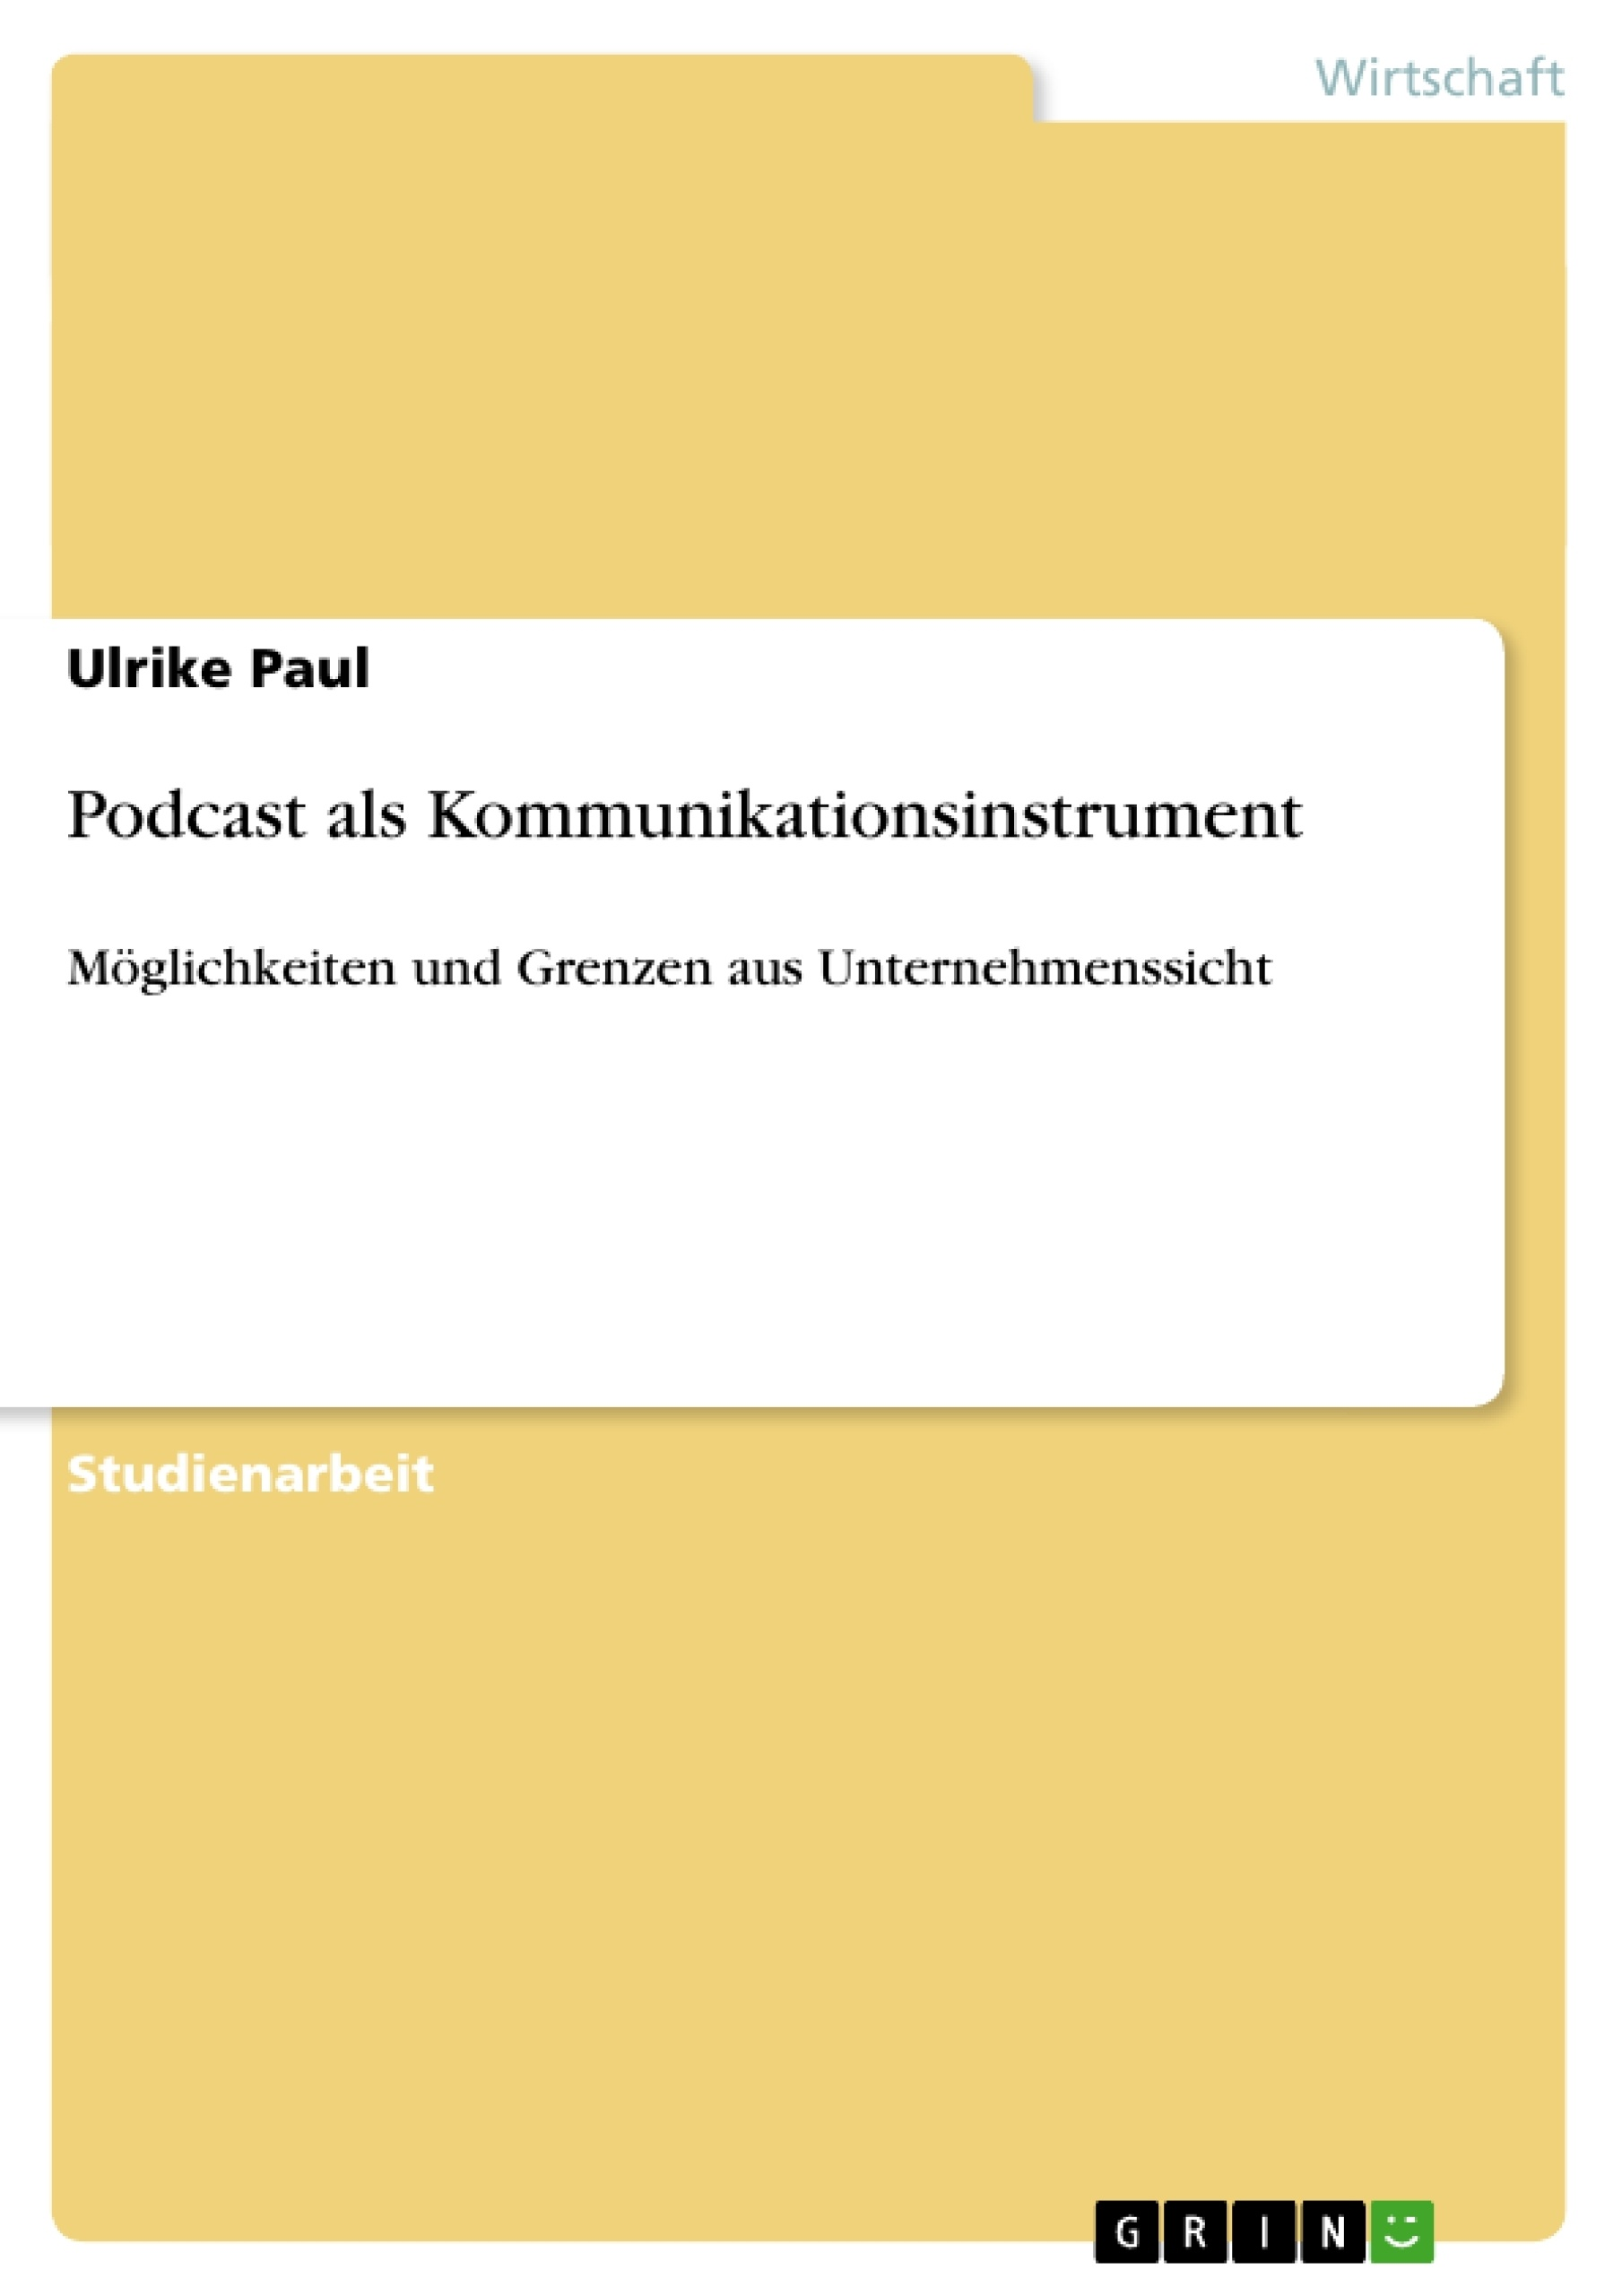 Titel: Podcast als Kommunikationsinstrument